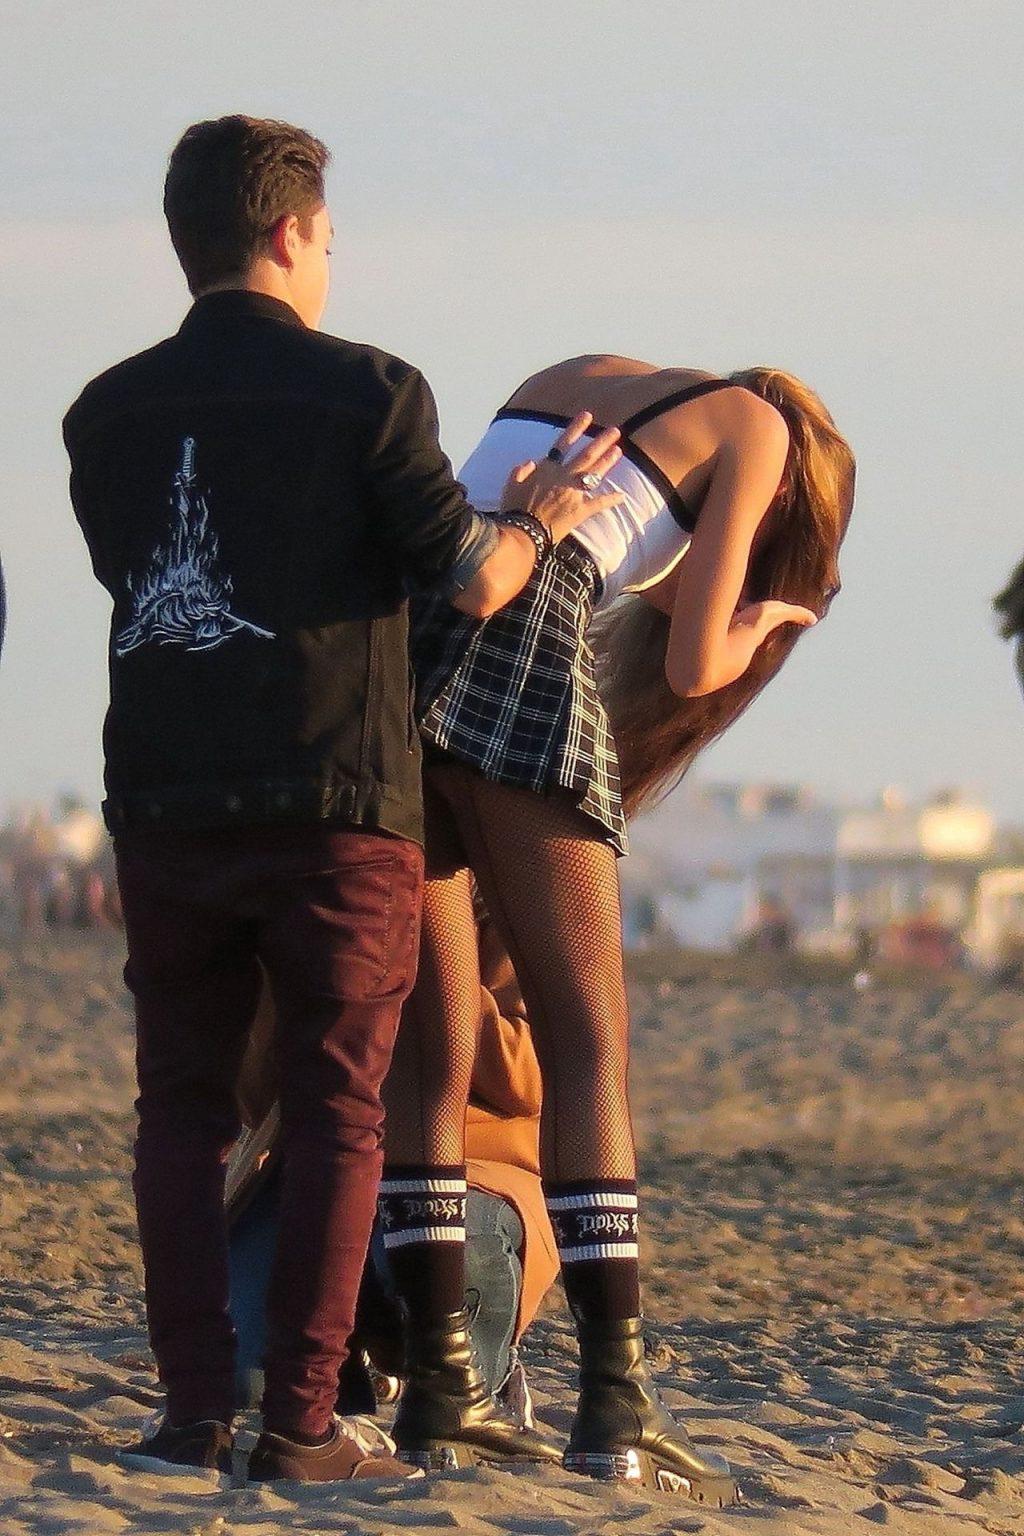 Chiara Bianchino is on the Beach at Fregene (58 Photos)